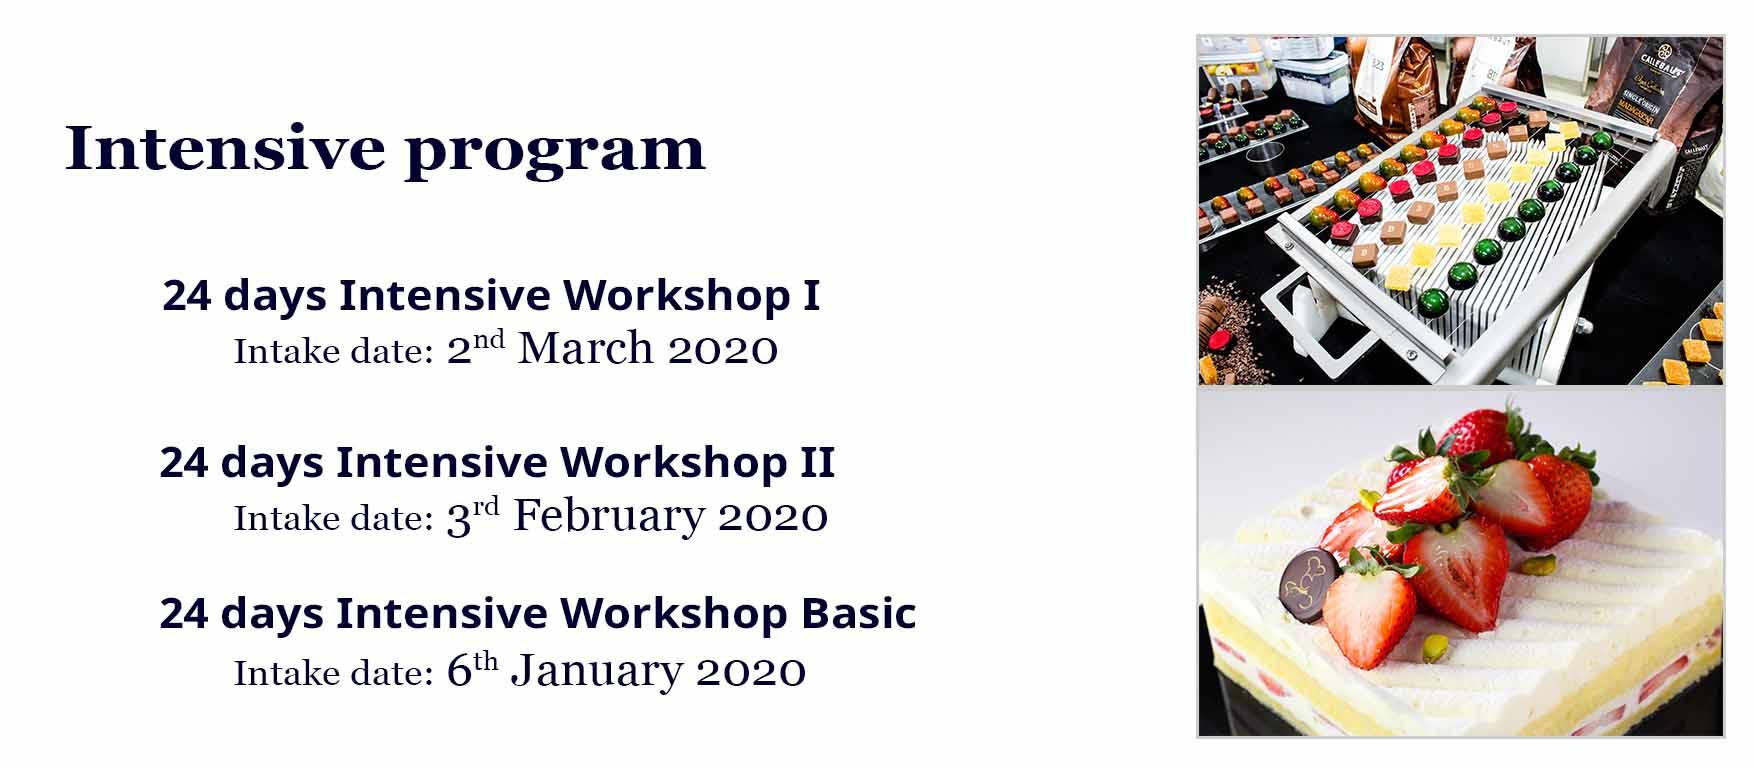 2020intensiveprogram